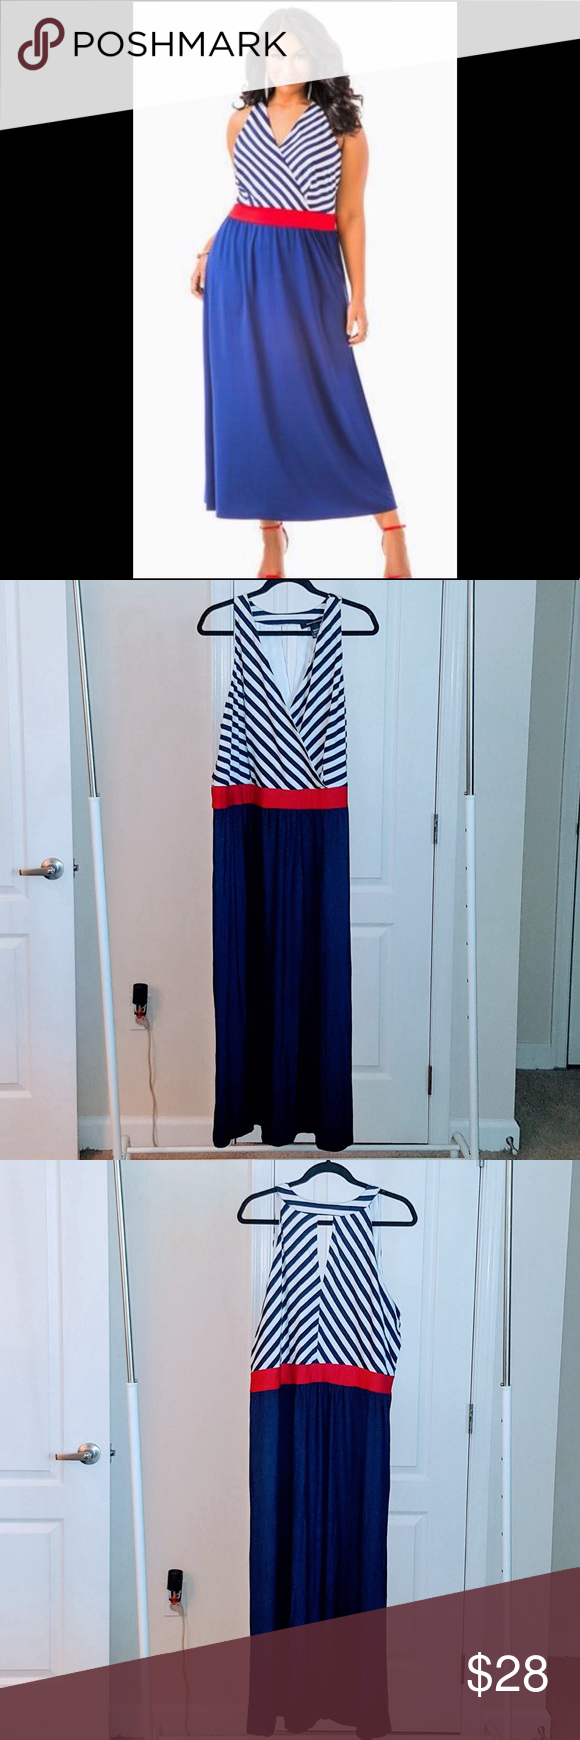 Ashley Stewart Americana Maxi Dress Size 26 Ashley Stewart Blue White And Red Americana Maxi Dress Nwt V Nec Ashley Stewart Dresses Clothes Design Blue Skirt [ 1740 x 580 Pixel ]